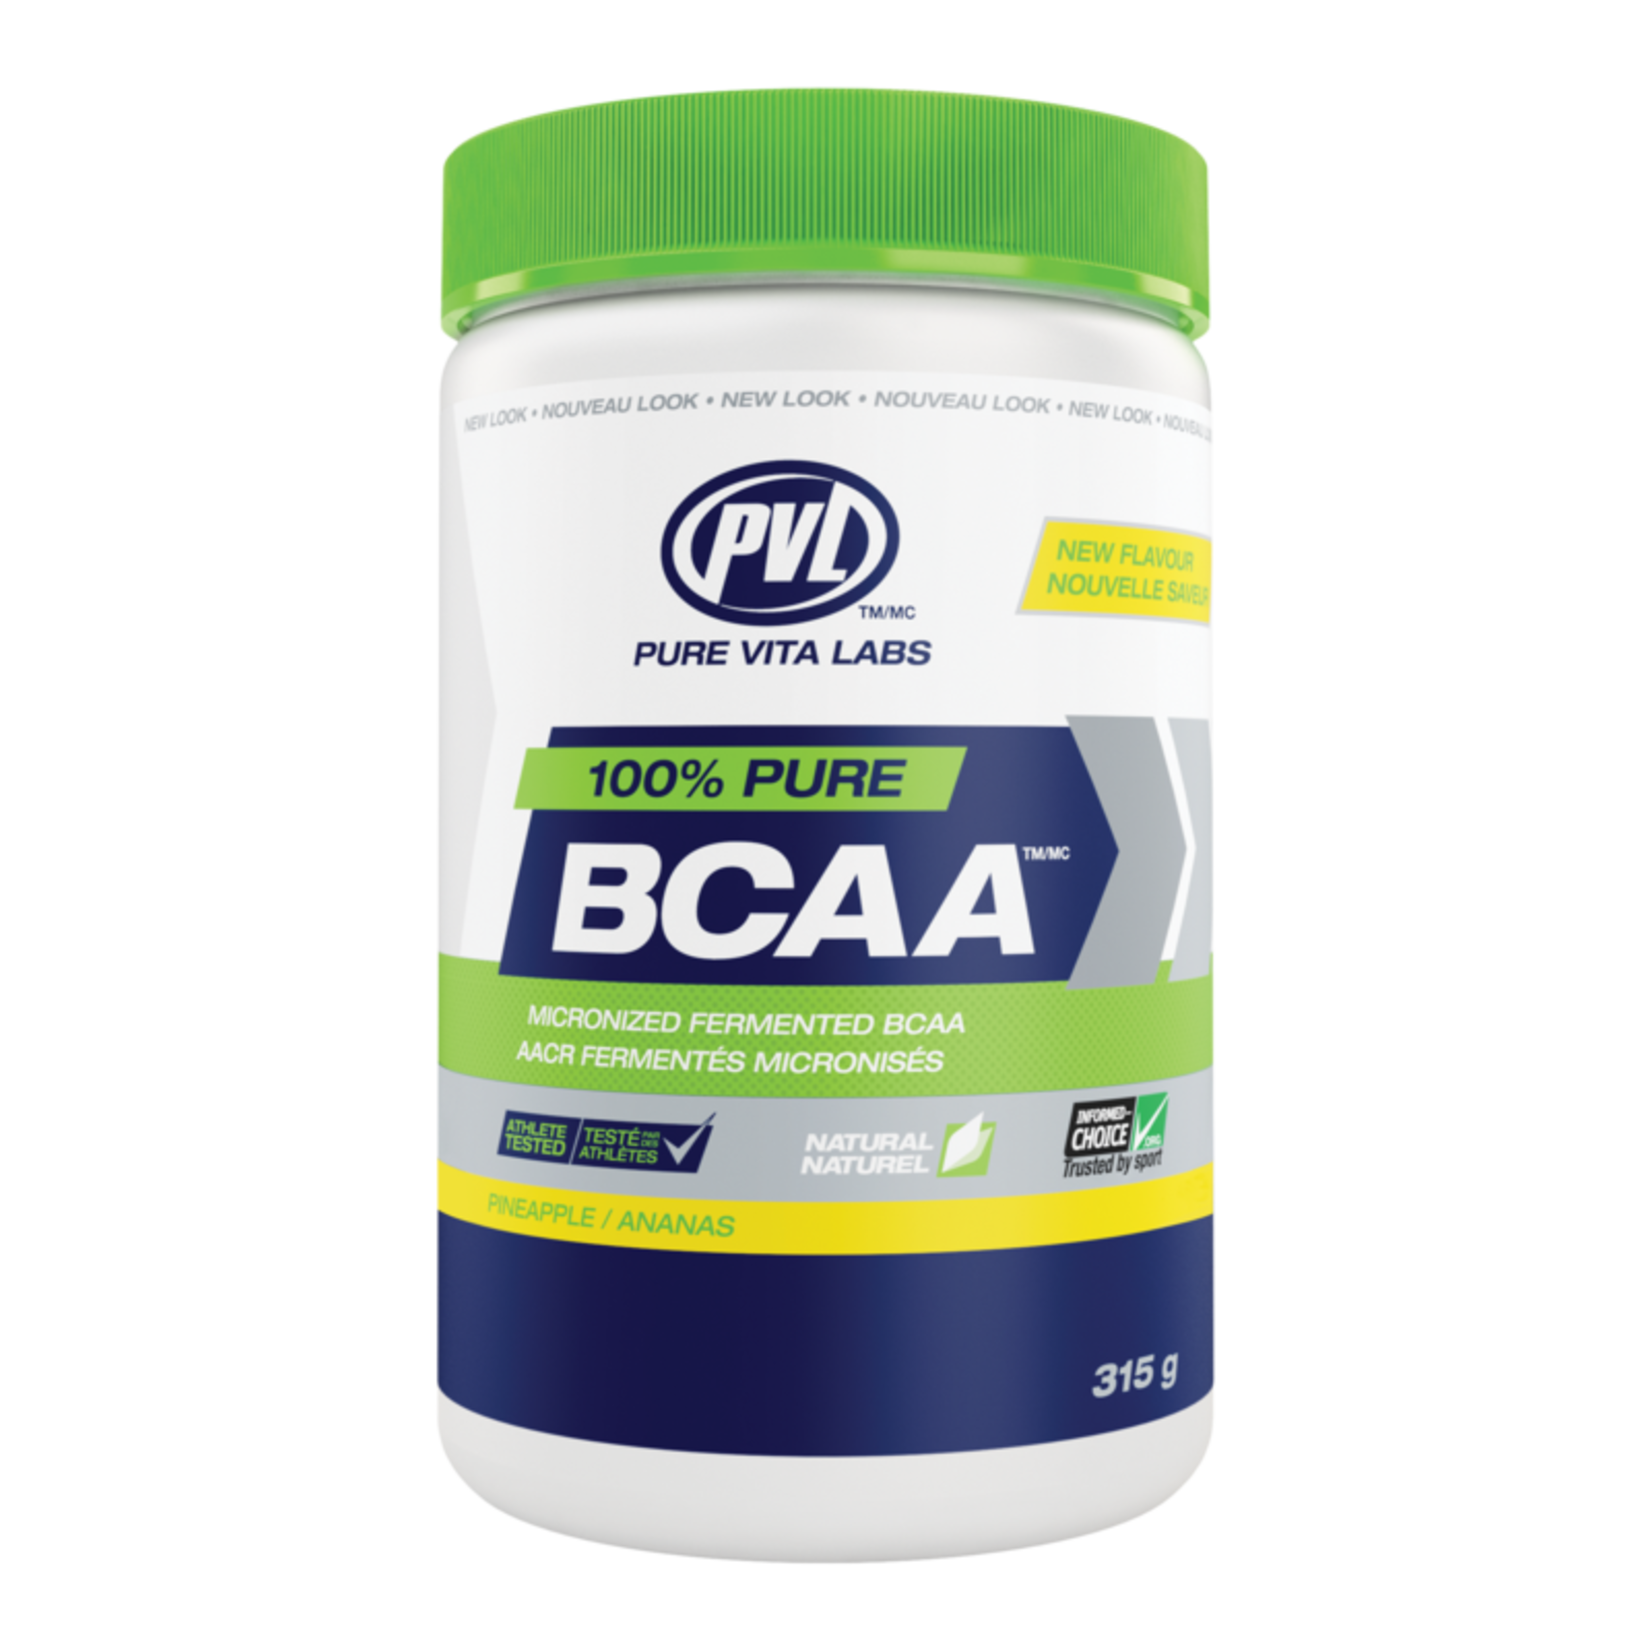 PVL 100% Pure BCAA - Pineapple 315g